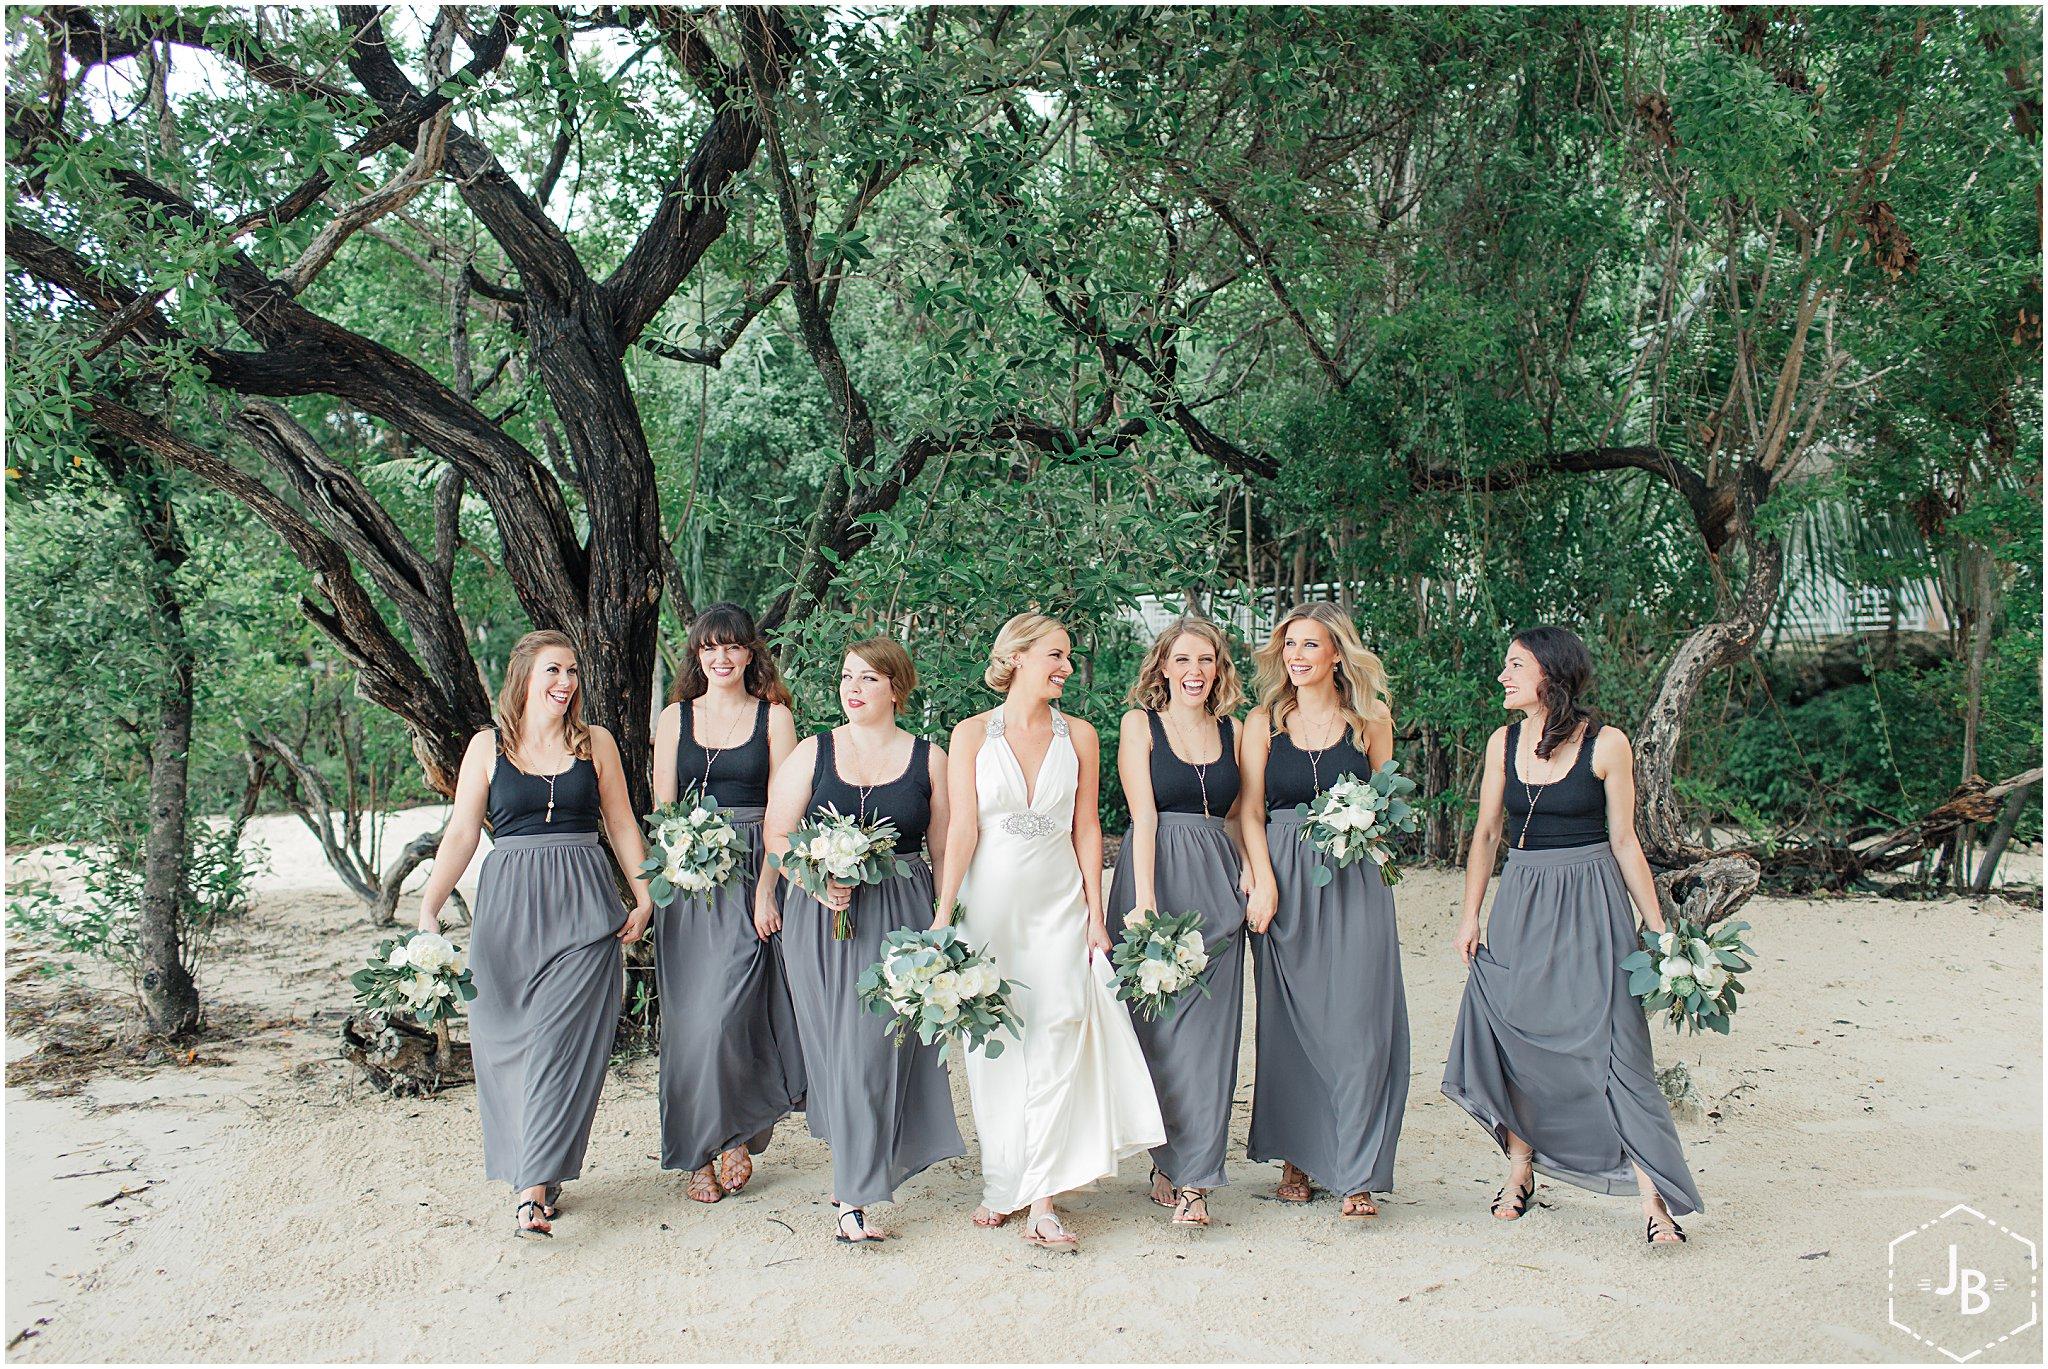 WeddingandEngagementFloridaPhotographer_1104.jpg